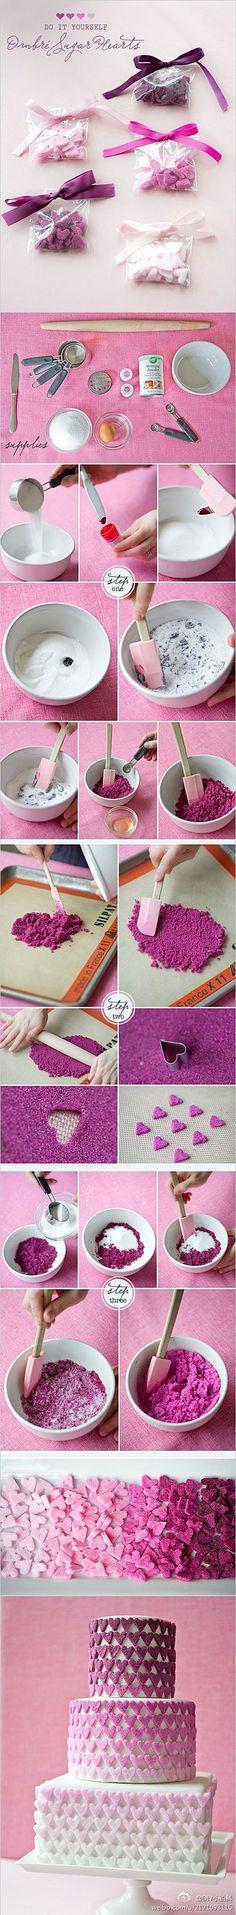 #DIY #HowTo Hearts for Heart Cake